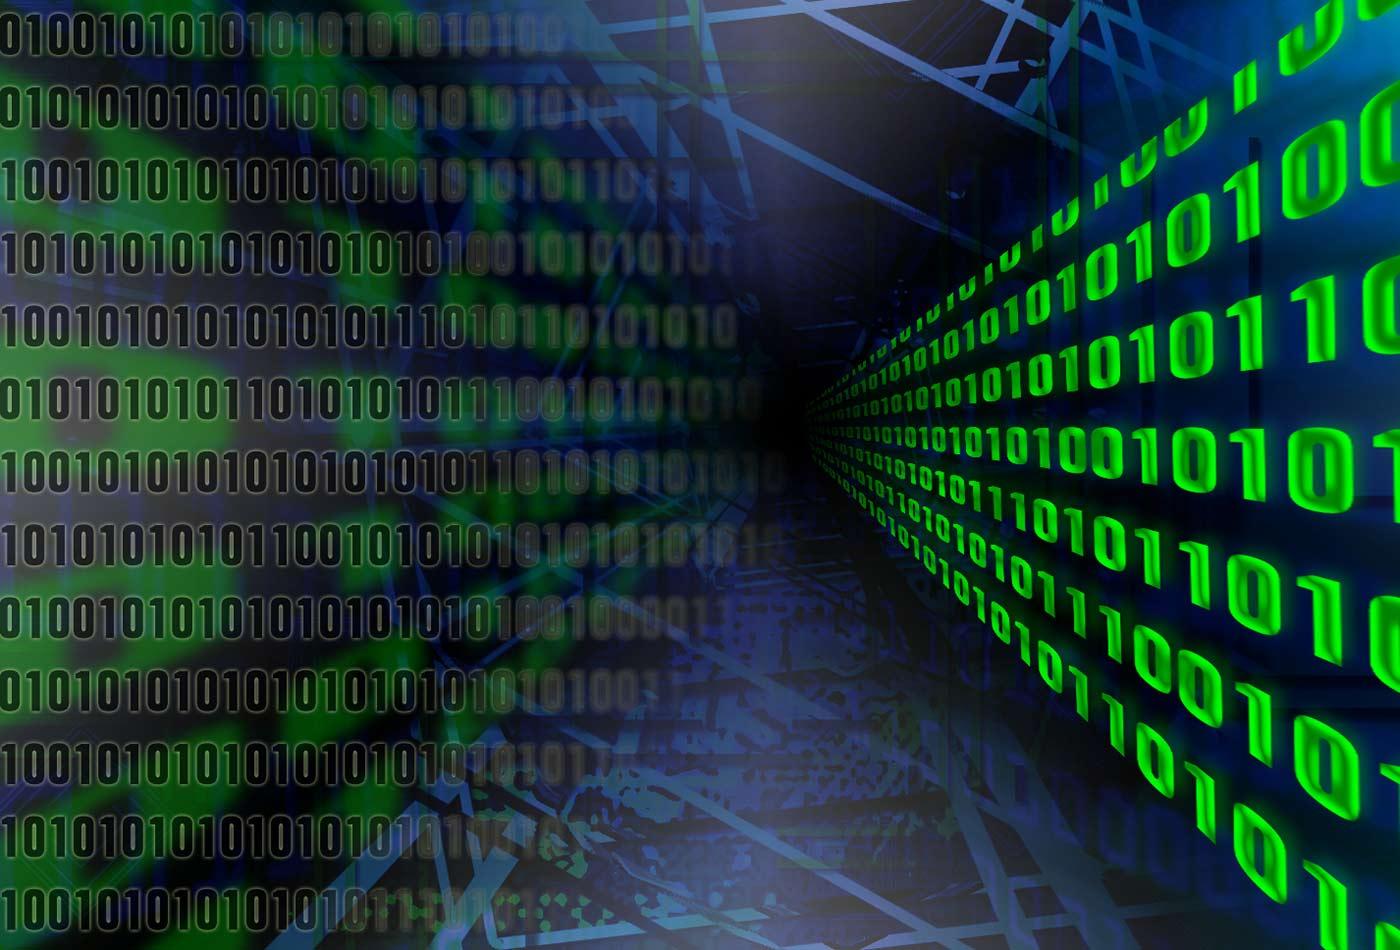 DARPA Big Data.